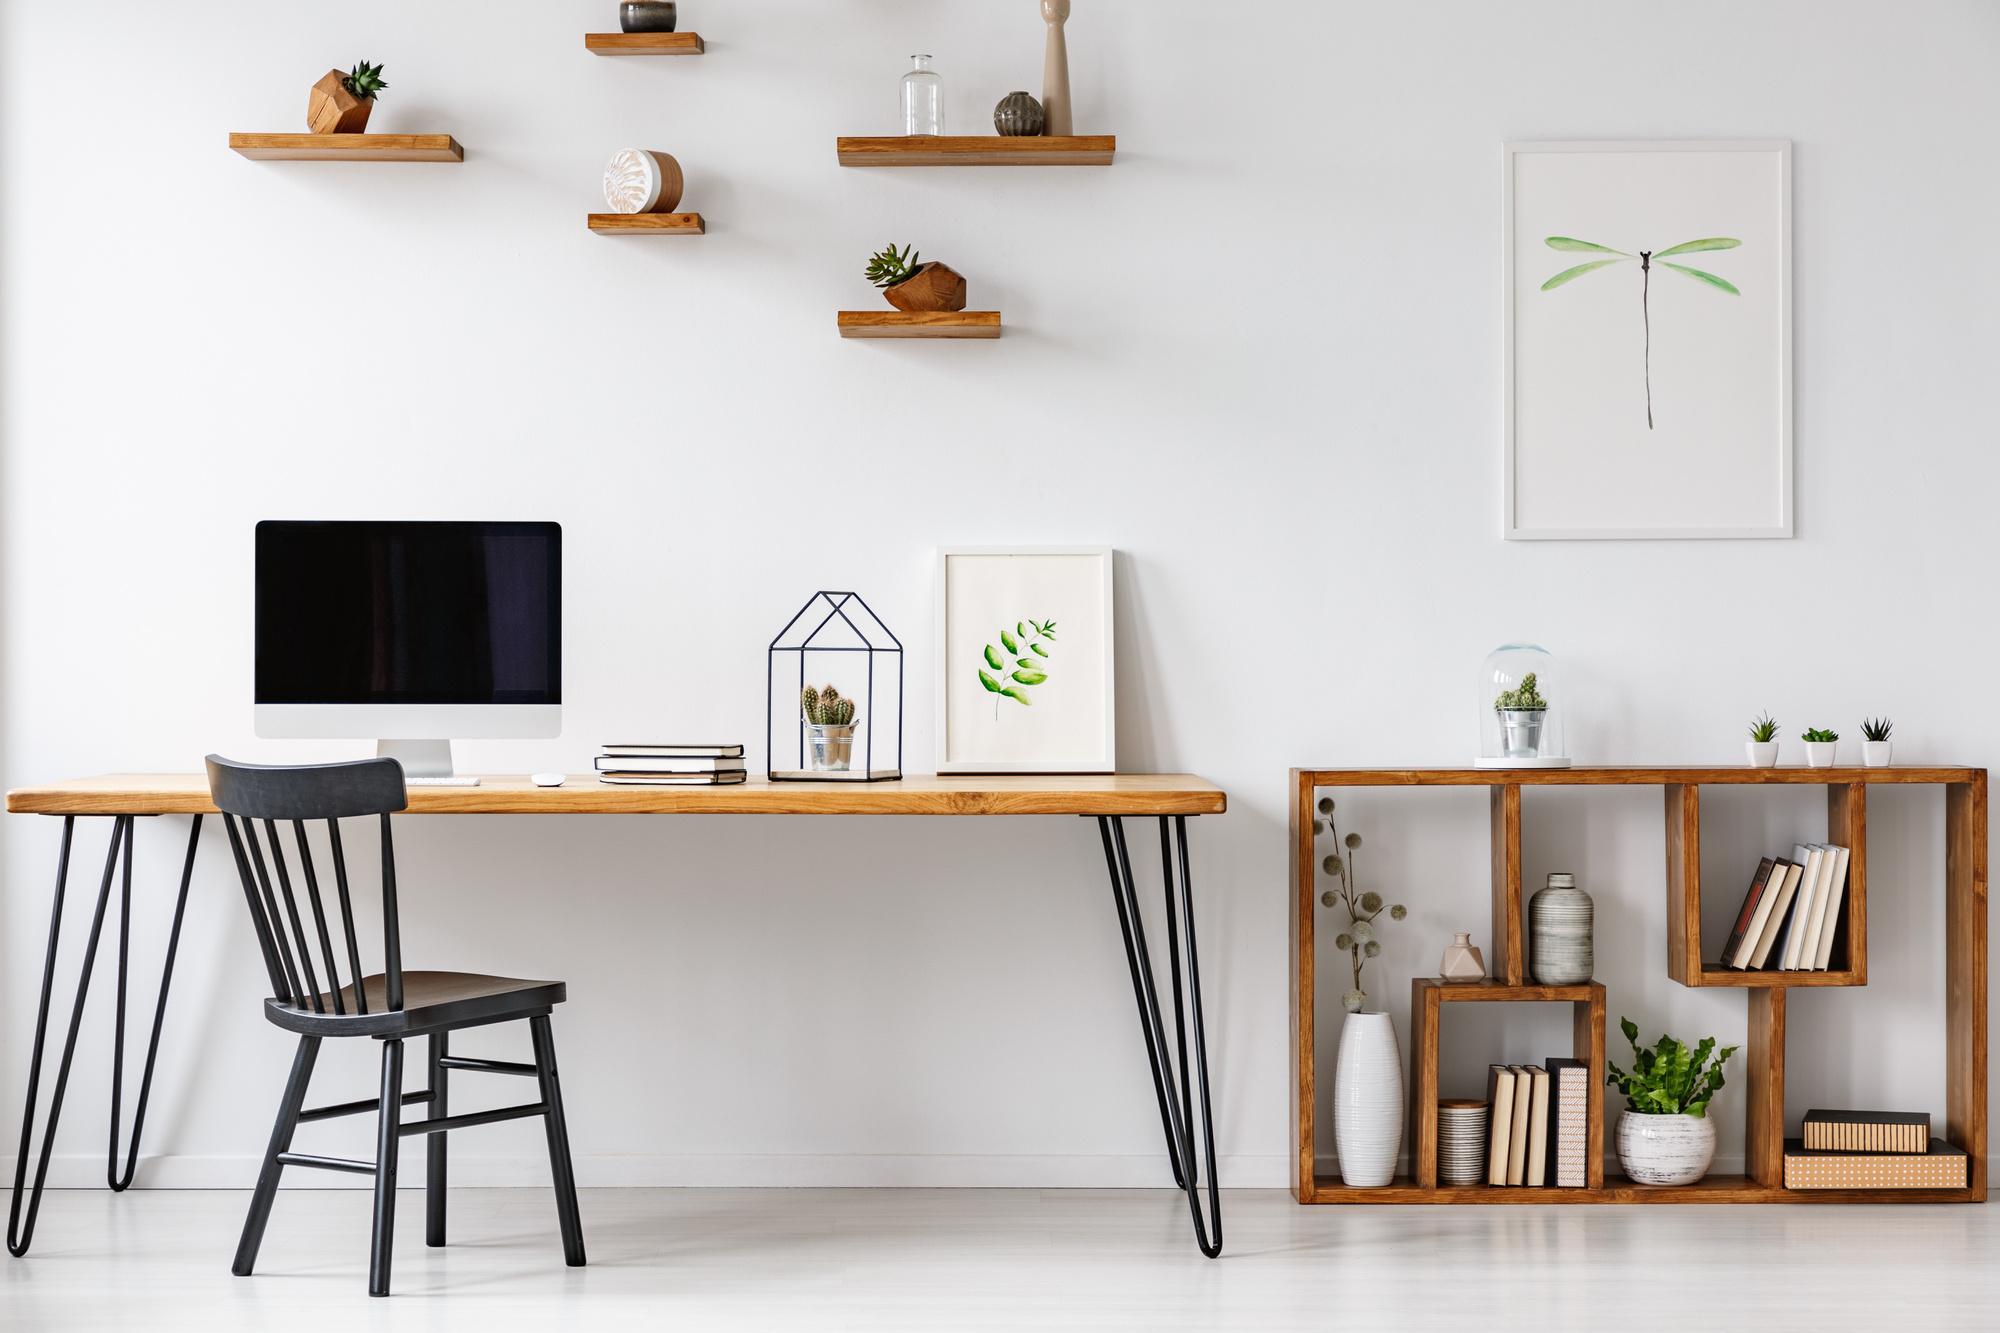 7 Simple Office Decor Ideas Interior Design Tours